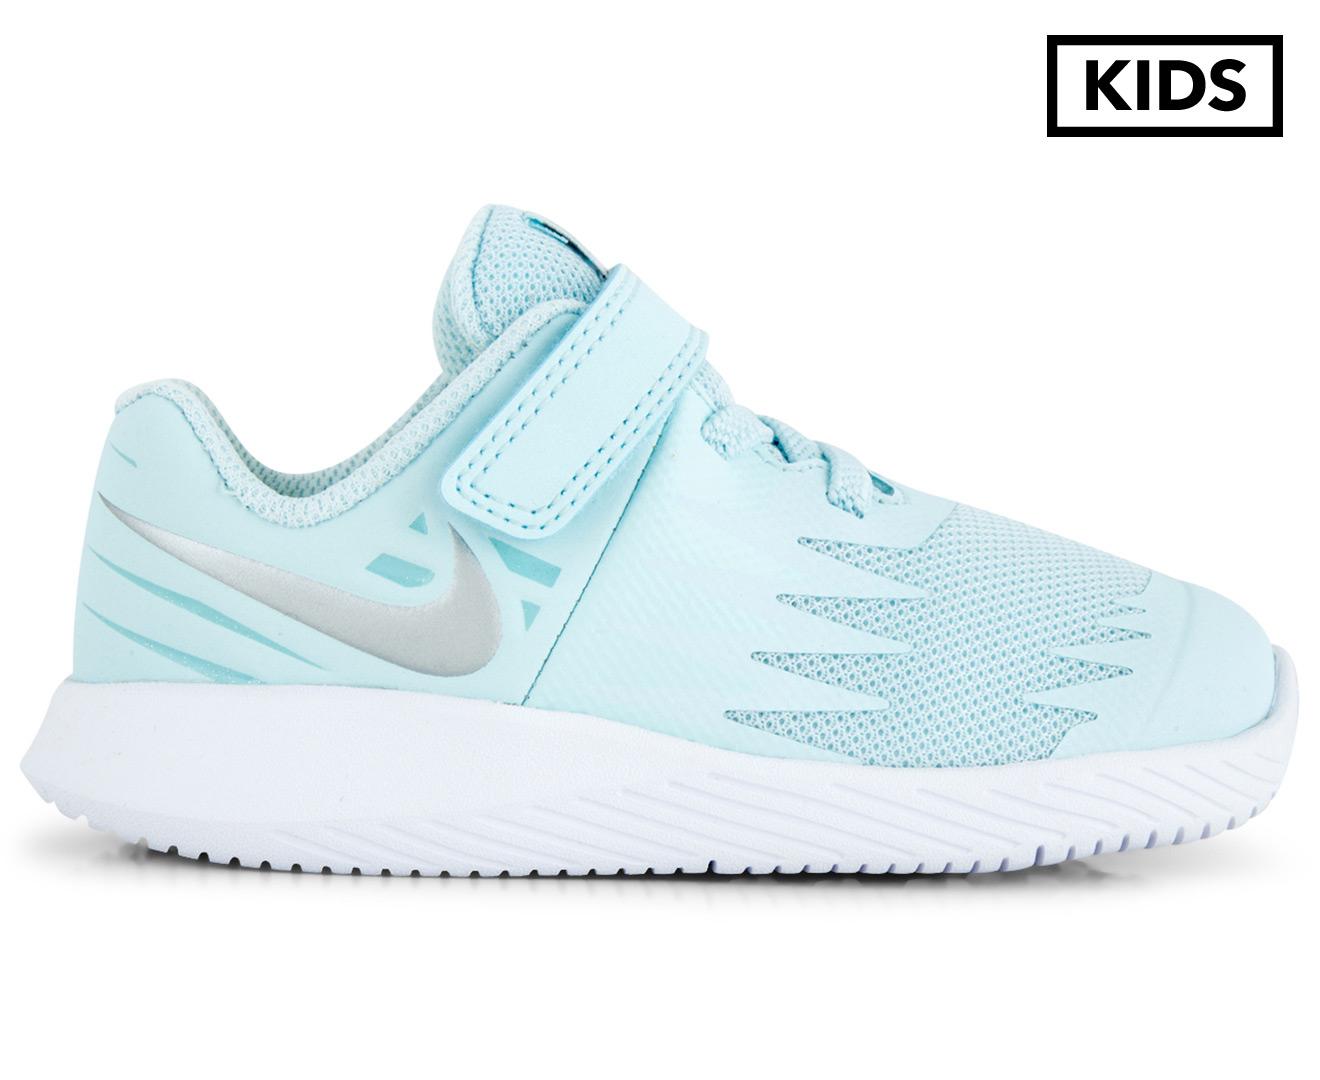 dentro de poco sobrino rechazo  Size 7c 907256-401 Glacier Blue GIRLS Nike Star Runner Shoes